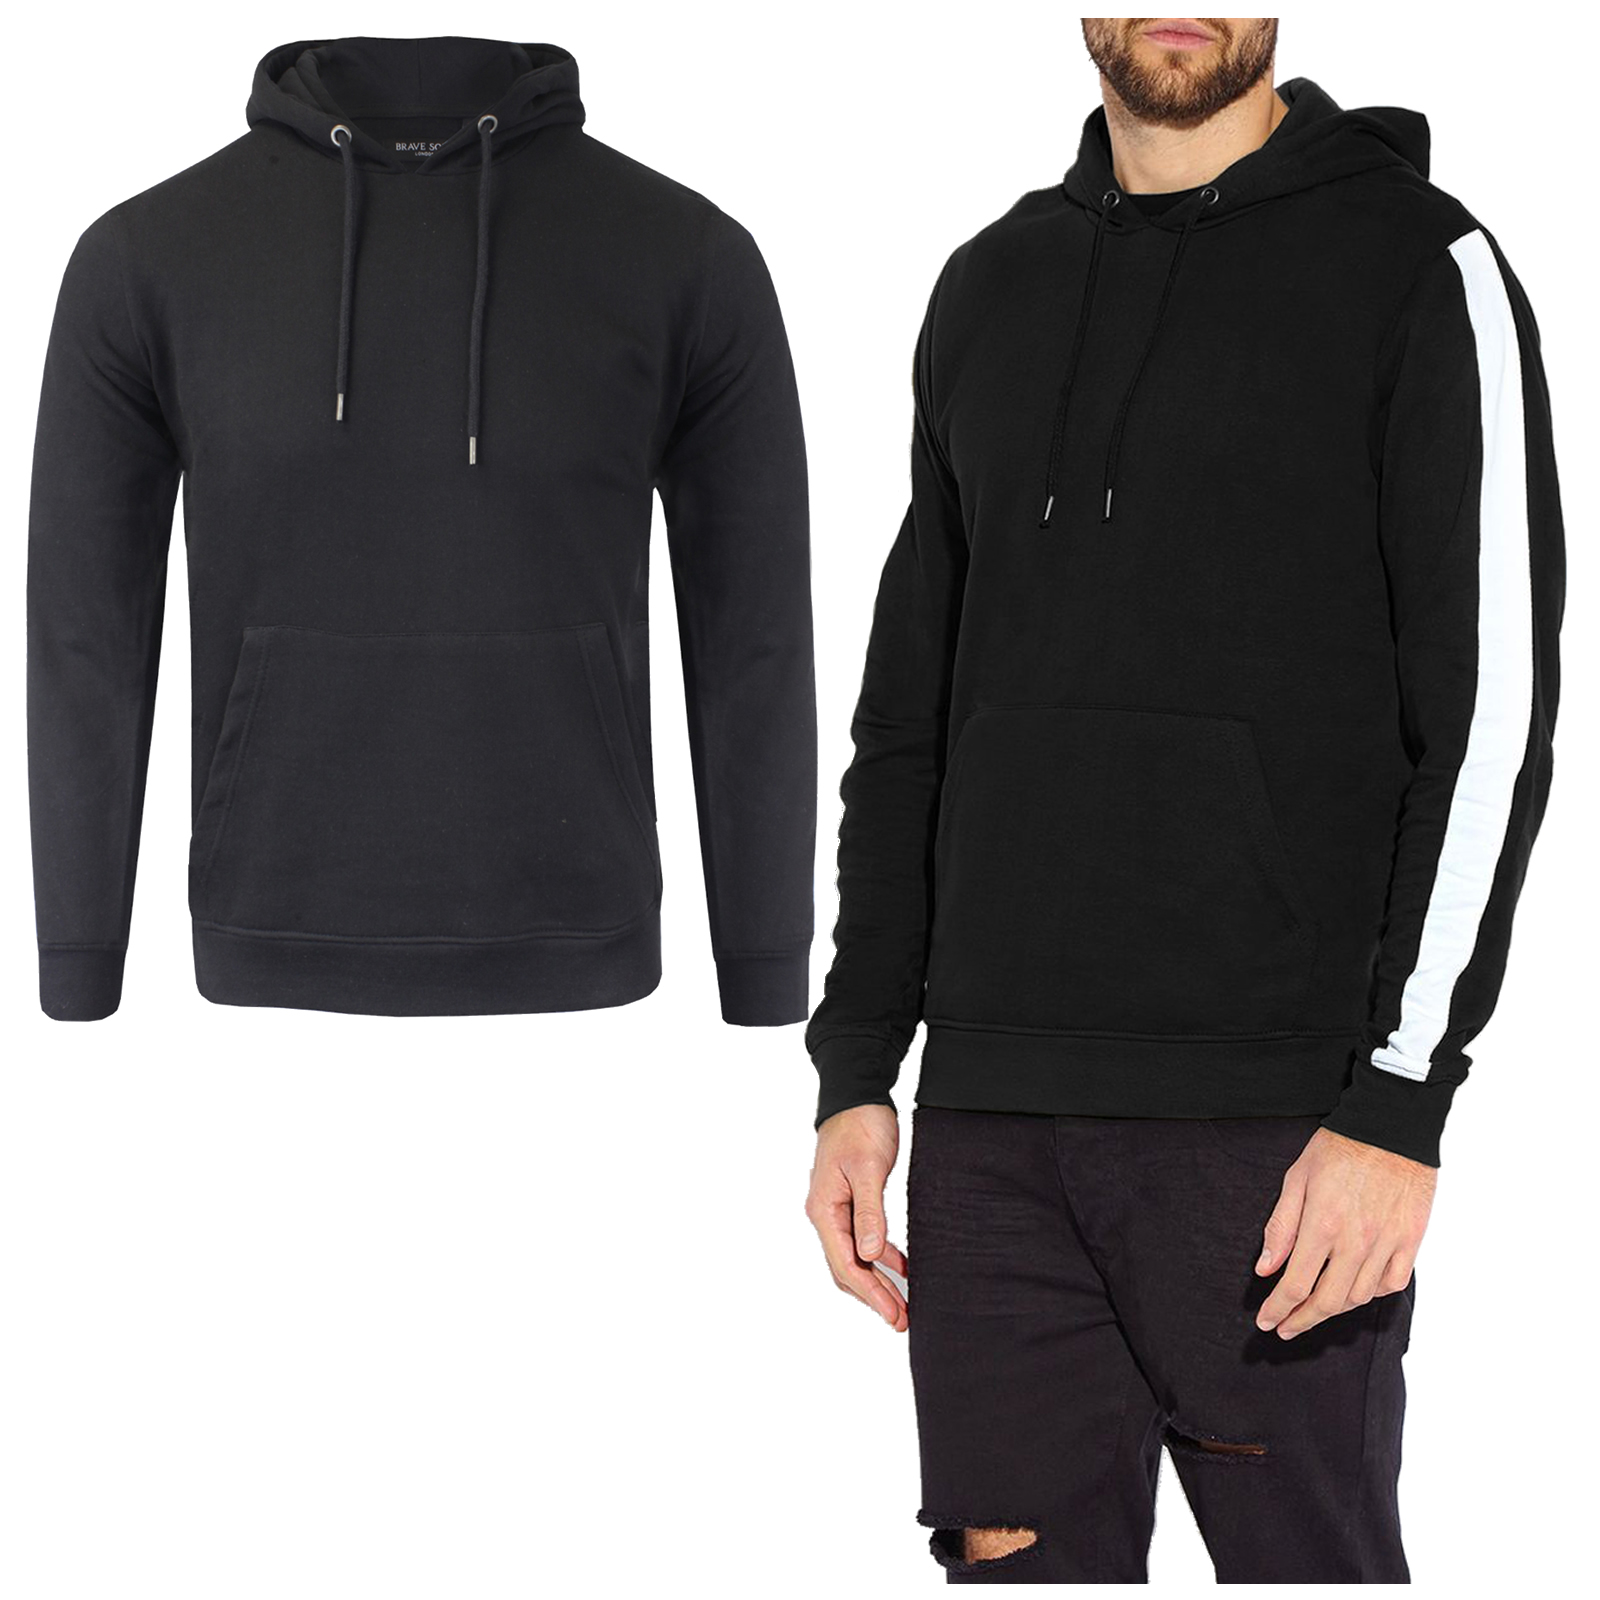 Men/'s Brave Soul Cotton Contrast Stripe Hooded Sweatshirt SS18 Sizes S-XL